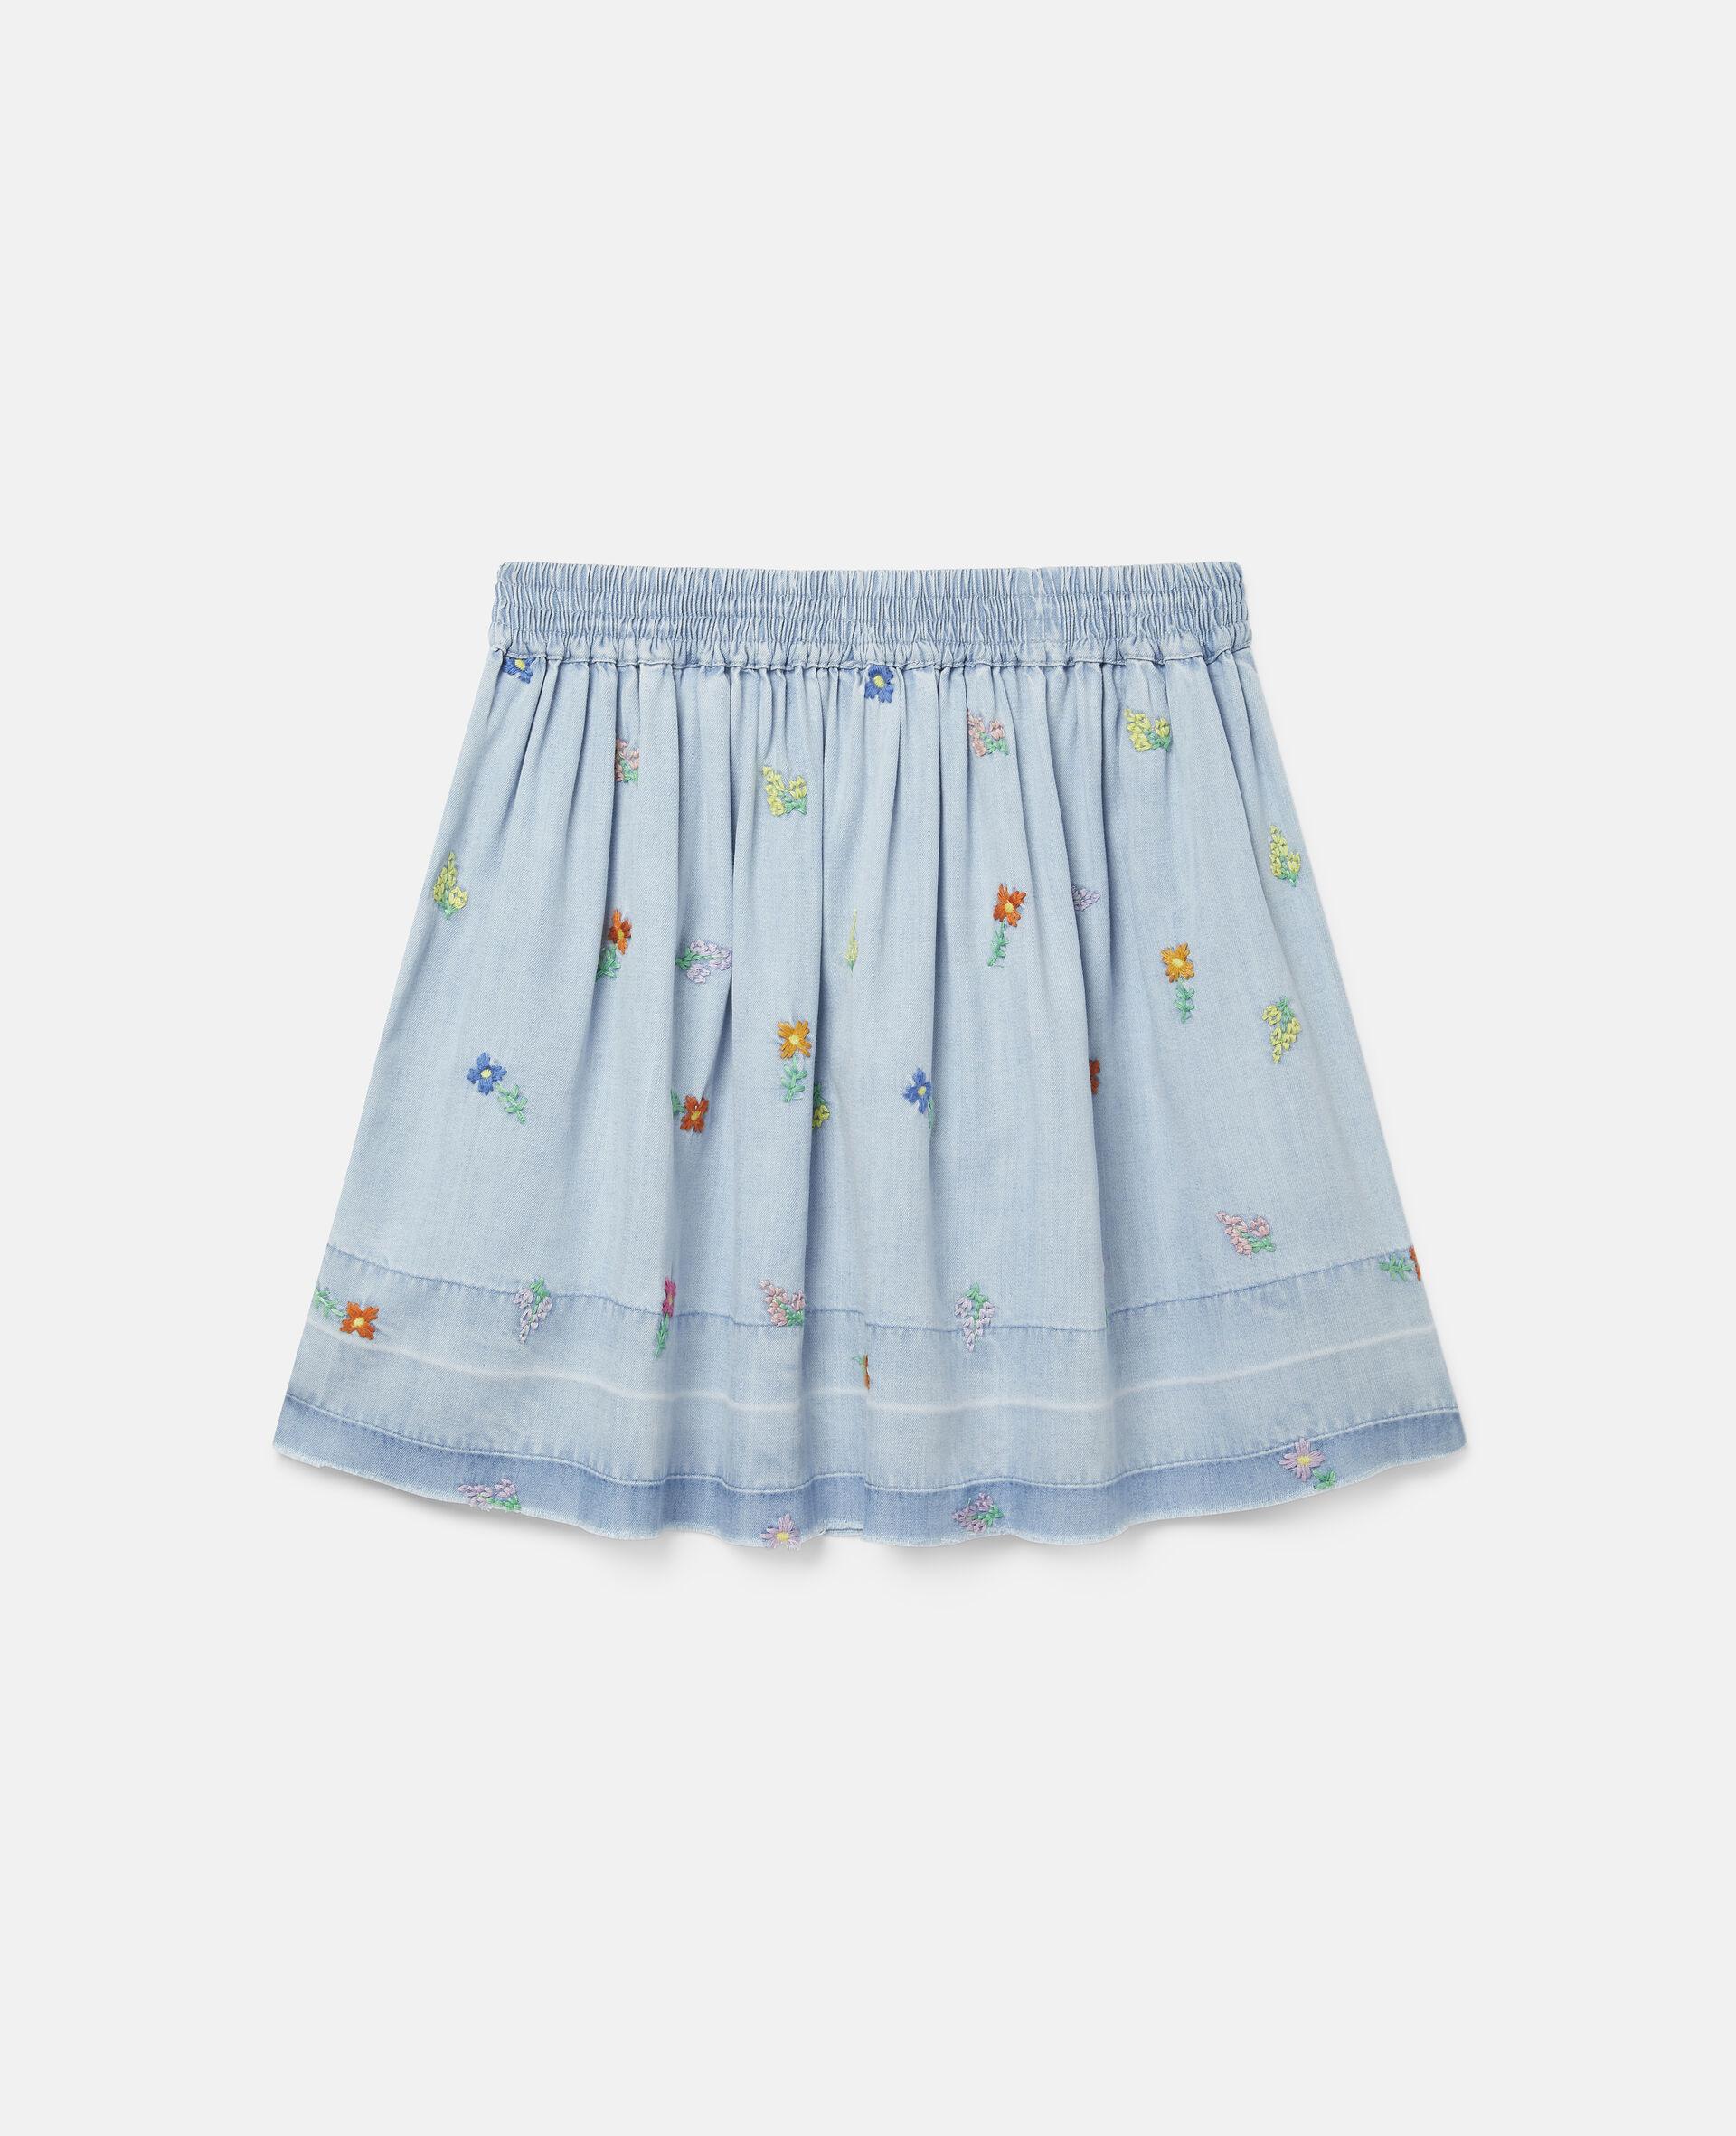 Embroidered Flowers Denim Skirt-Blue-large image number 3